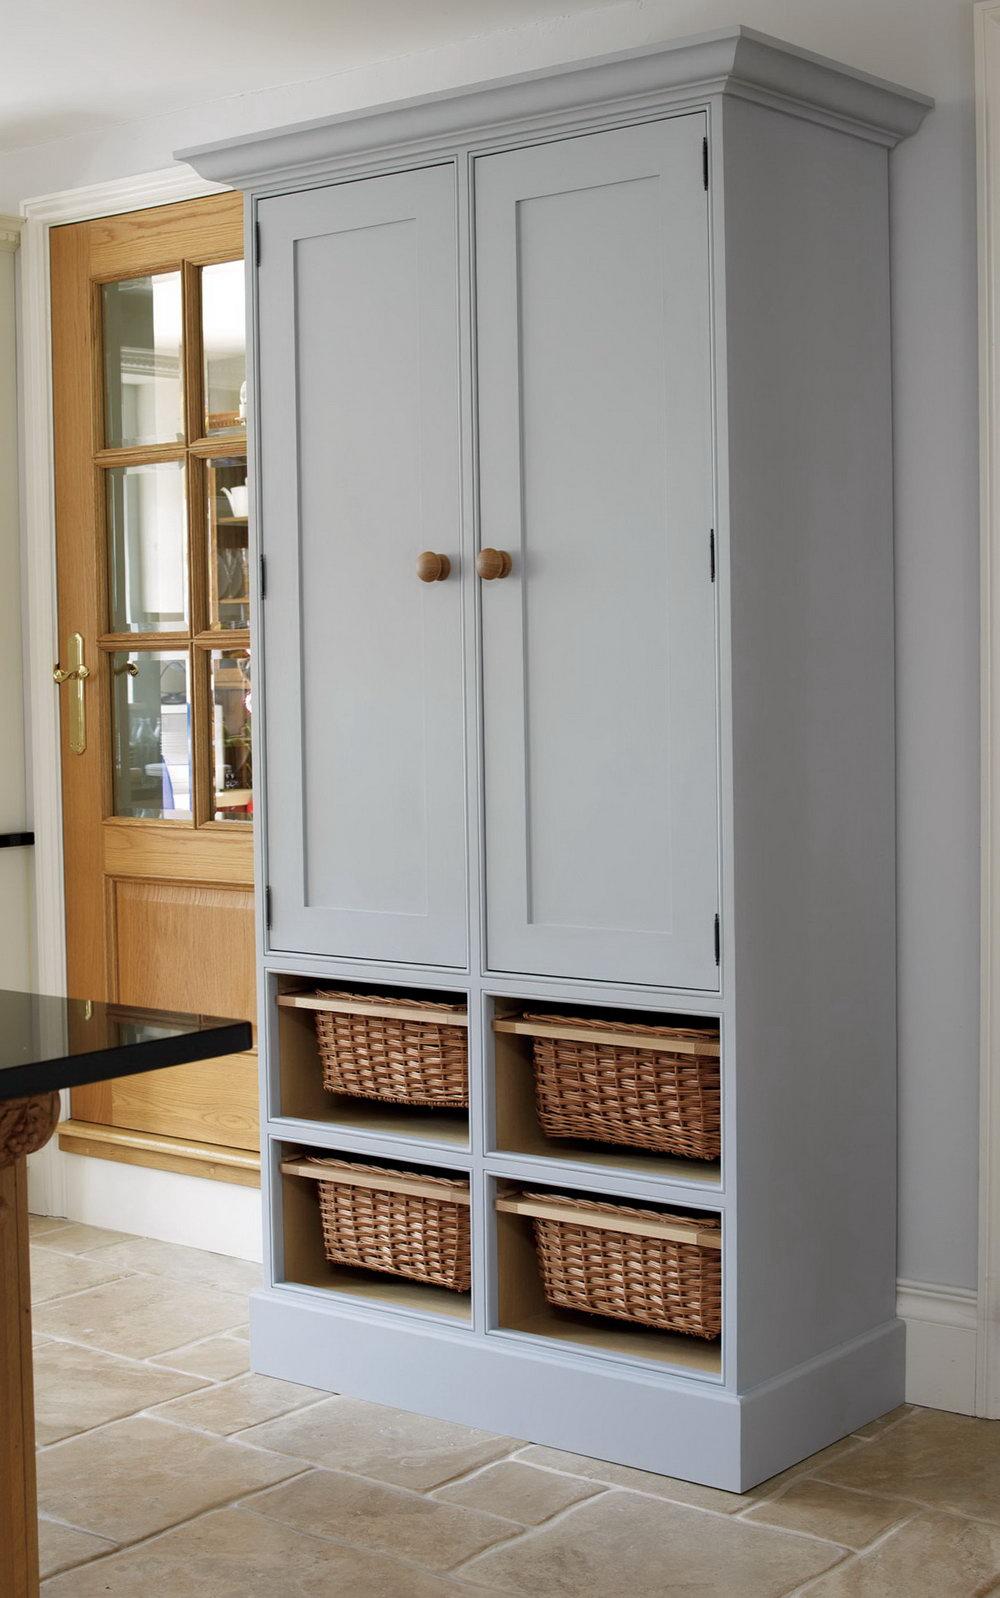 Kitchen Pantry Cabinet Freestanding Ikea